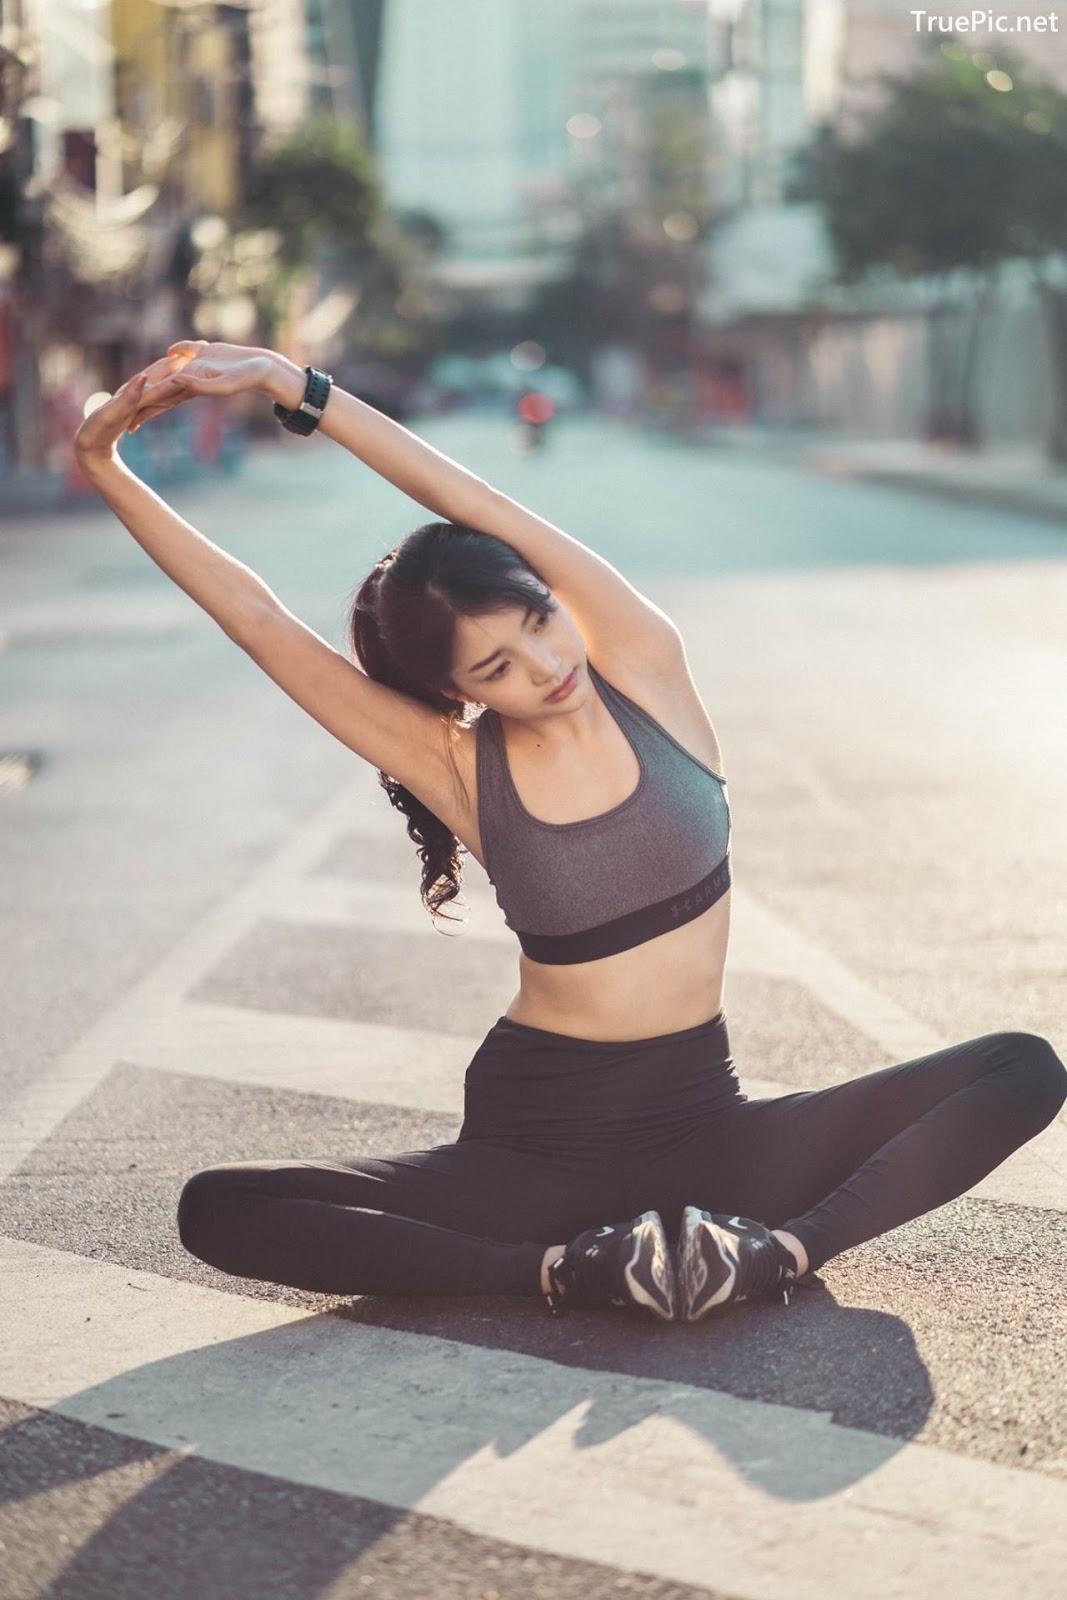 Image-Thailand-Pretty-Model-Anun-Sasinun-Beautiful-Fitness-Girl-TruePic.net- Picture-1